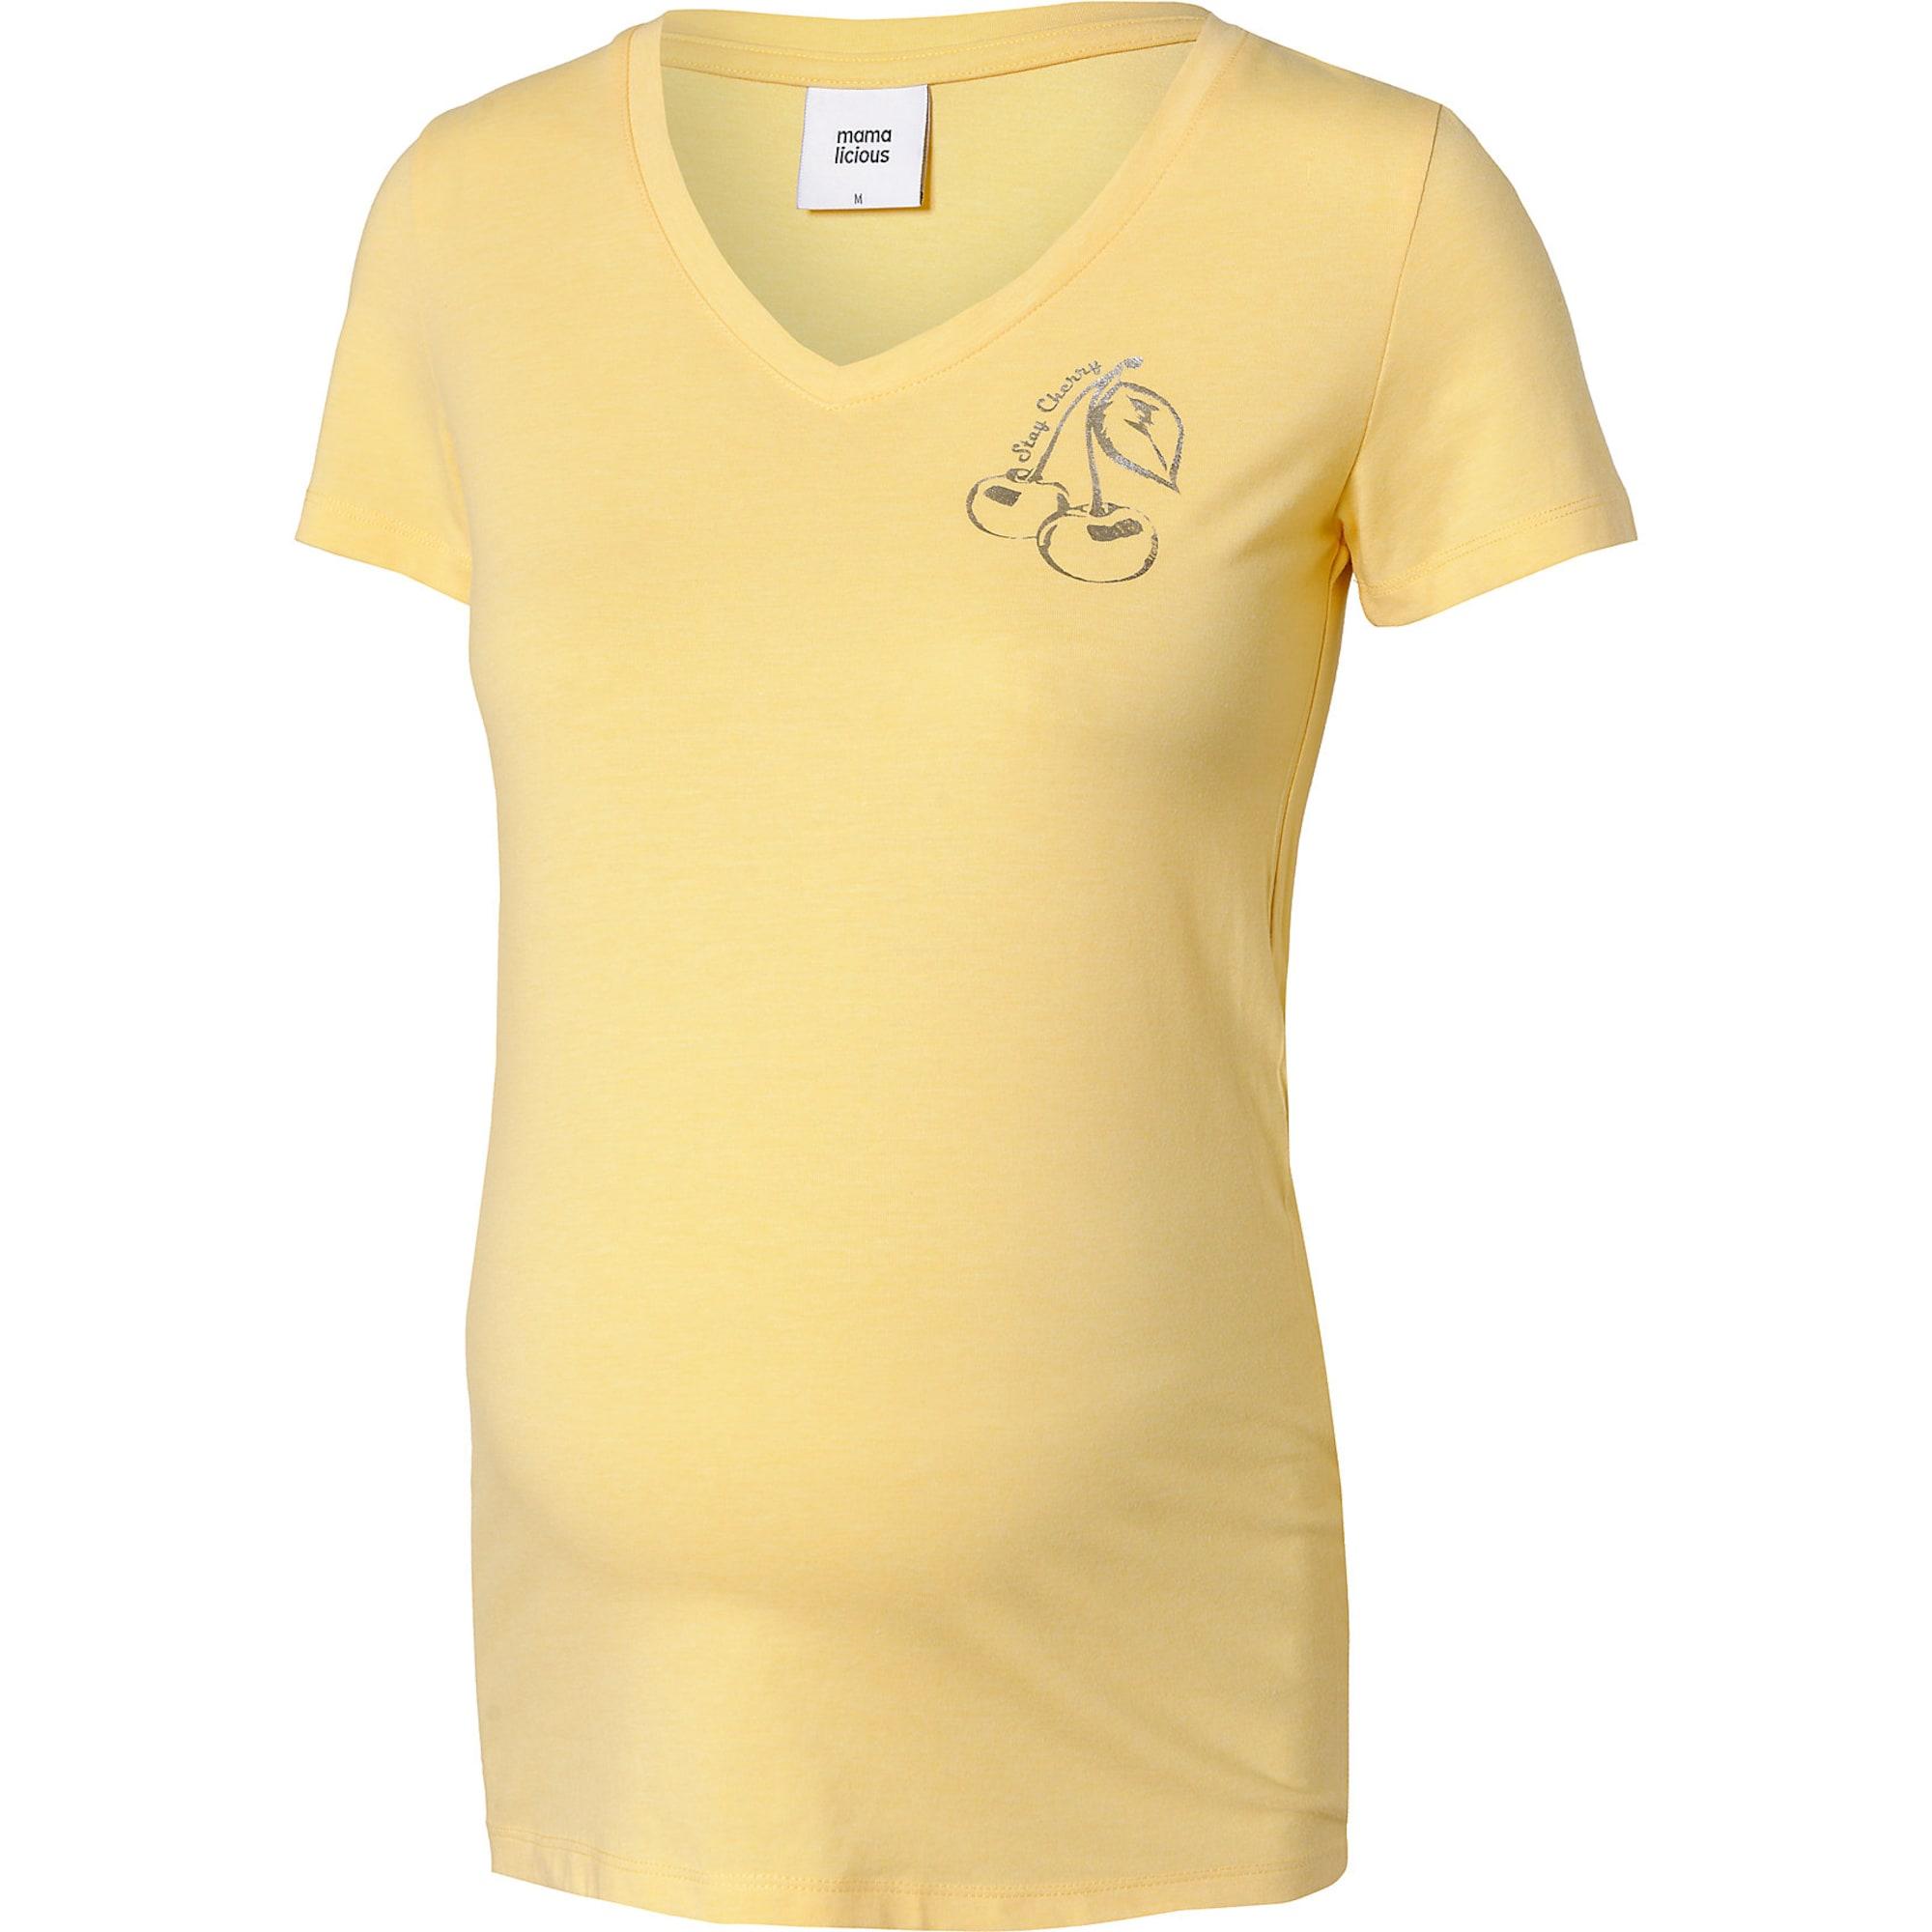 Umstandsshirt 'MLCherry' | Bekleidung > Umstandsmode > Umstandsshirts | Gelb | Mamalicious